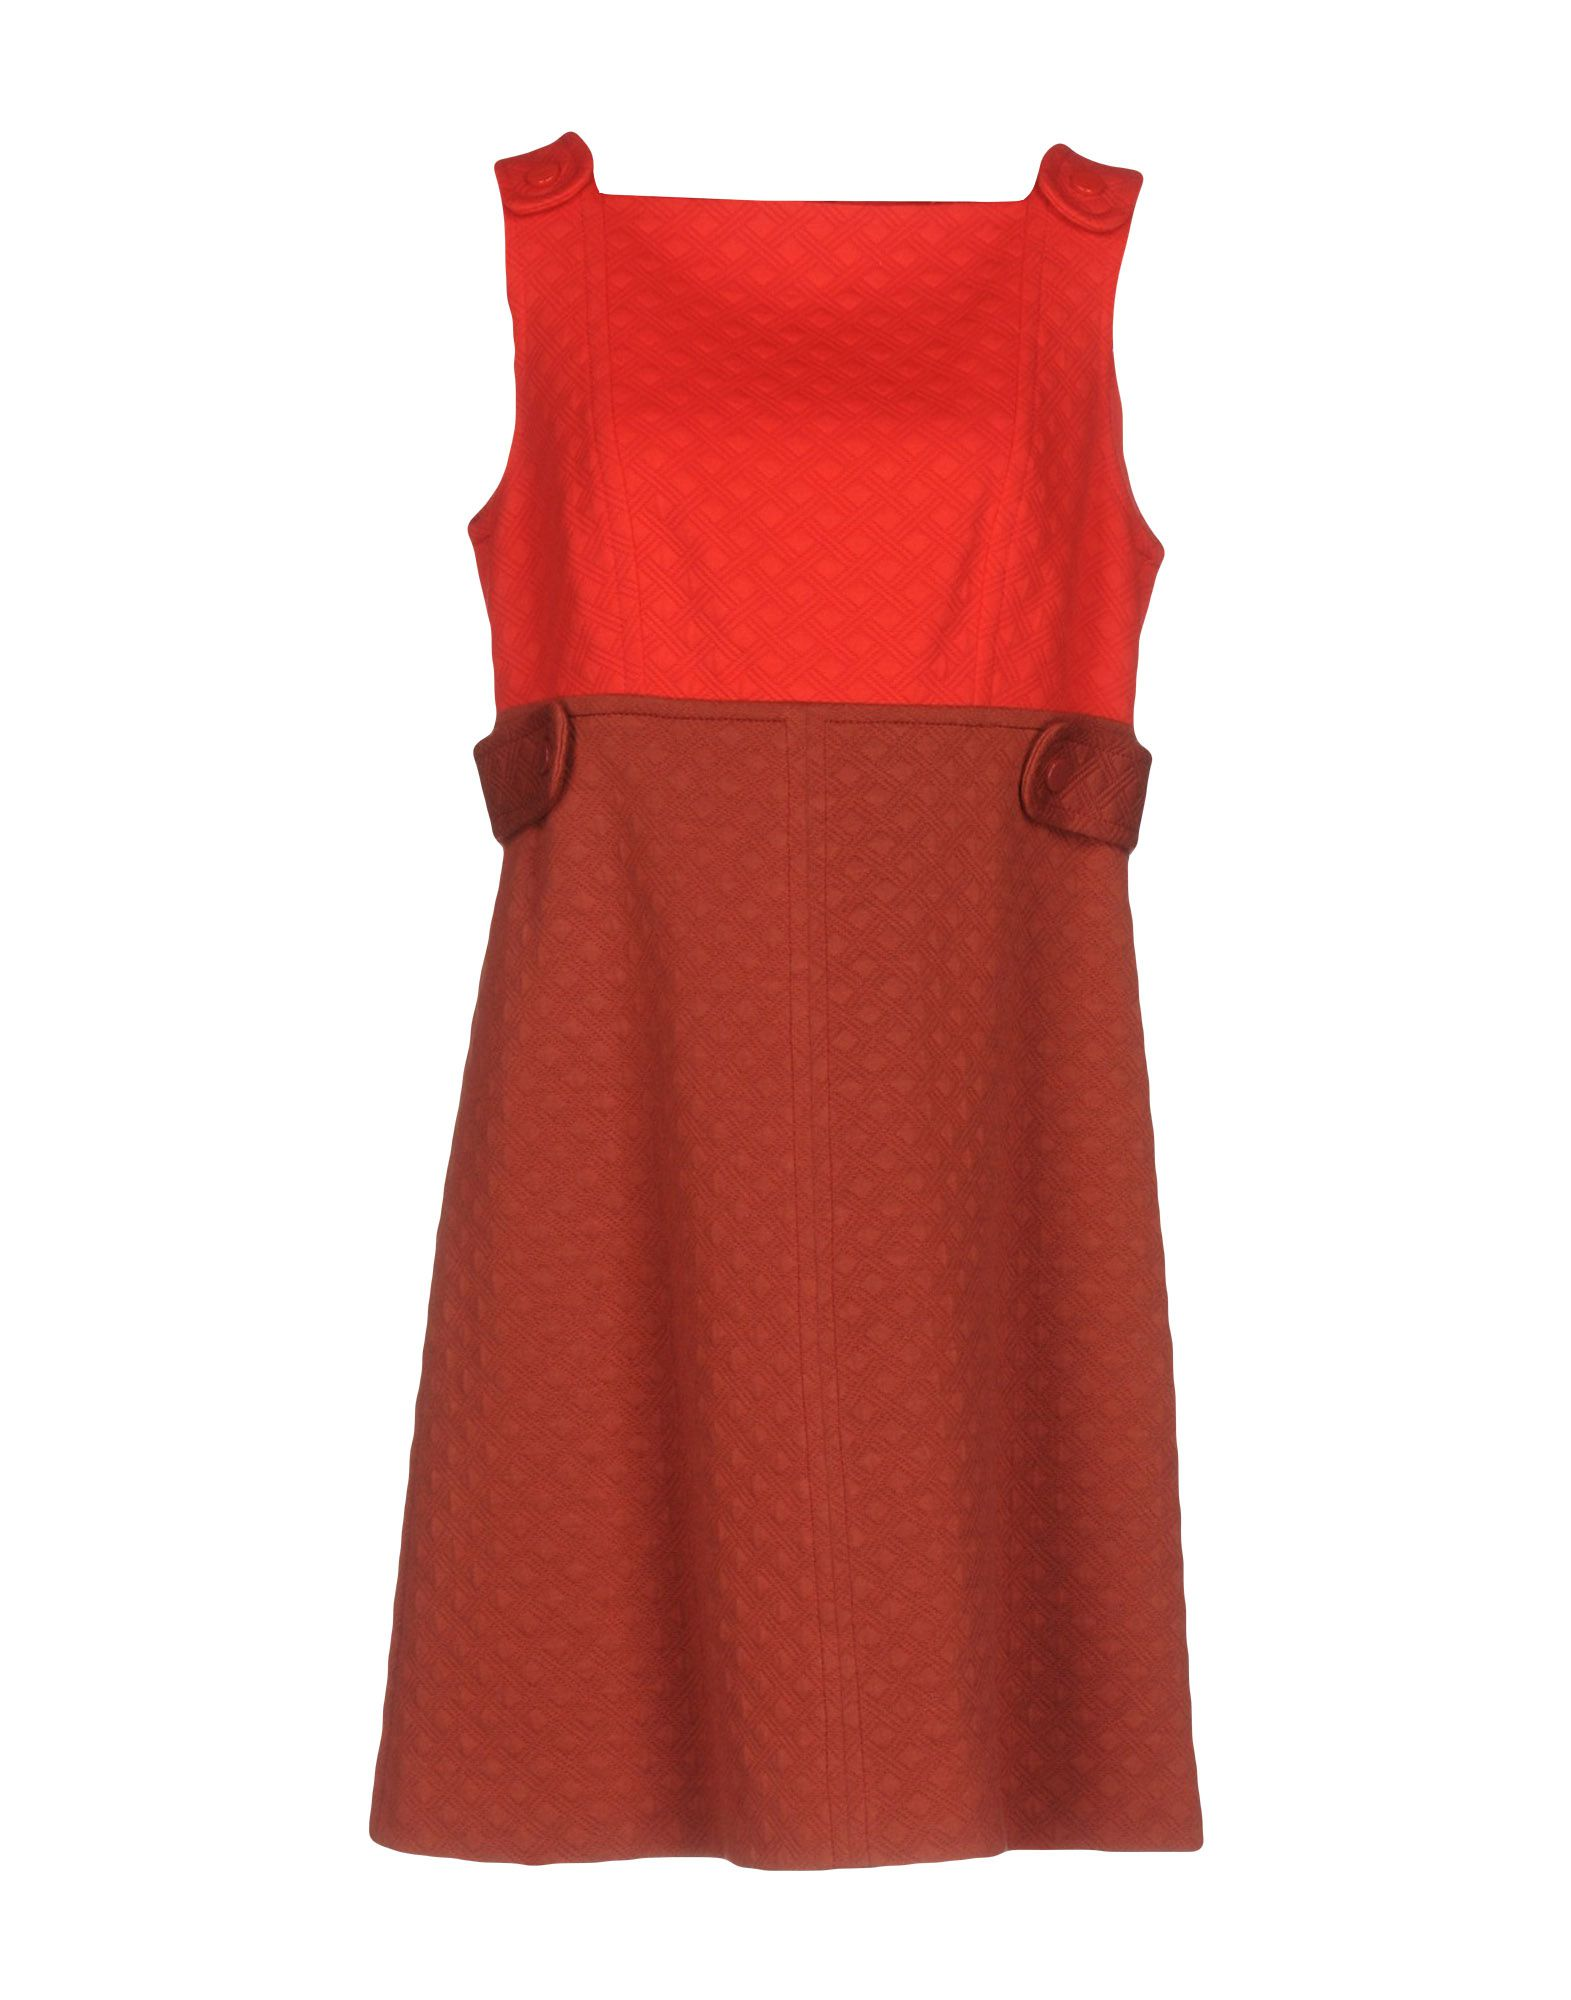 M MISSONI Damen Kurzes Kleid Farbe Rot Größe 6